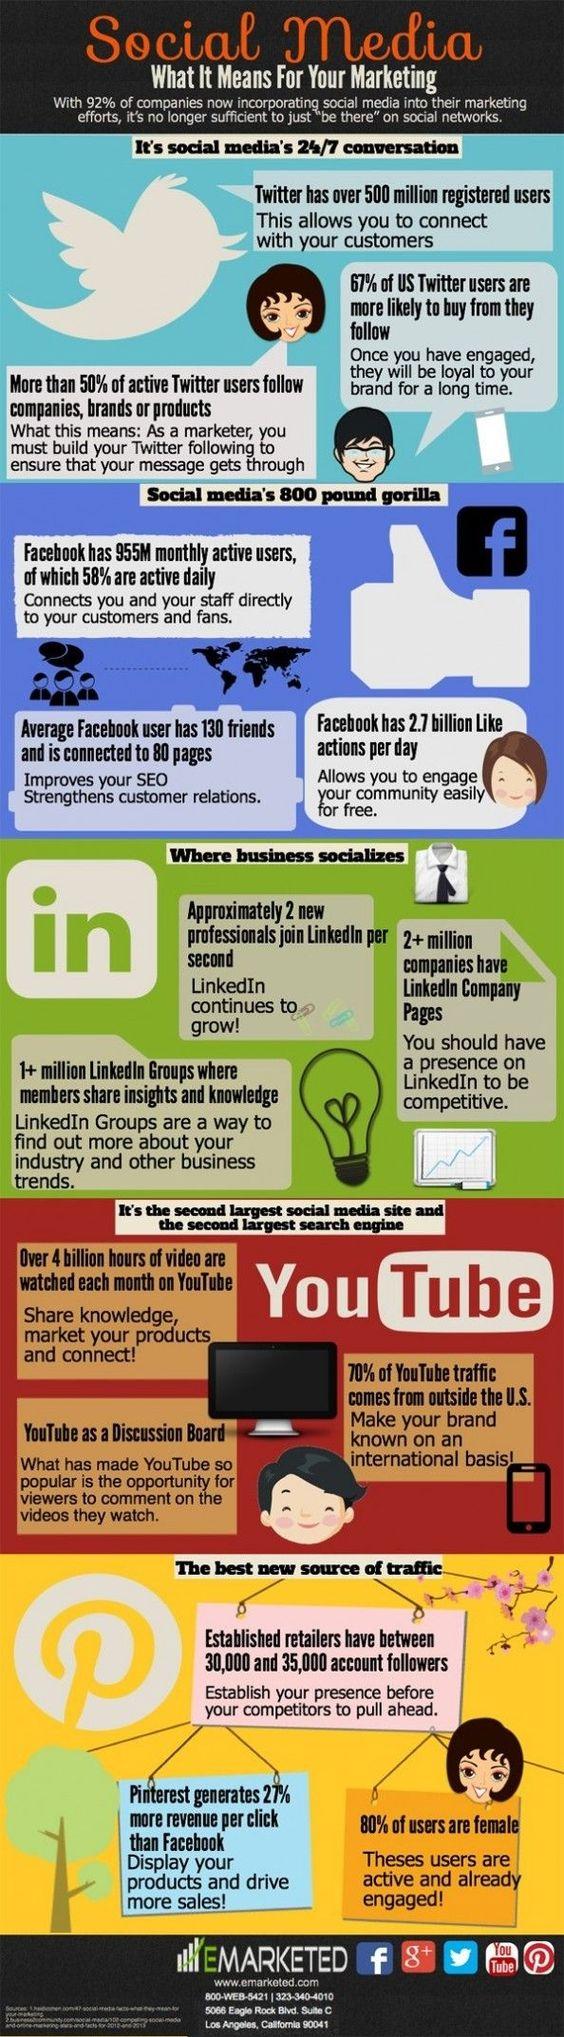 Social Media Secrets Infographic by lorene